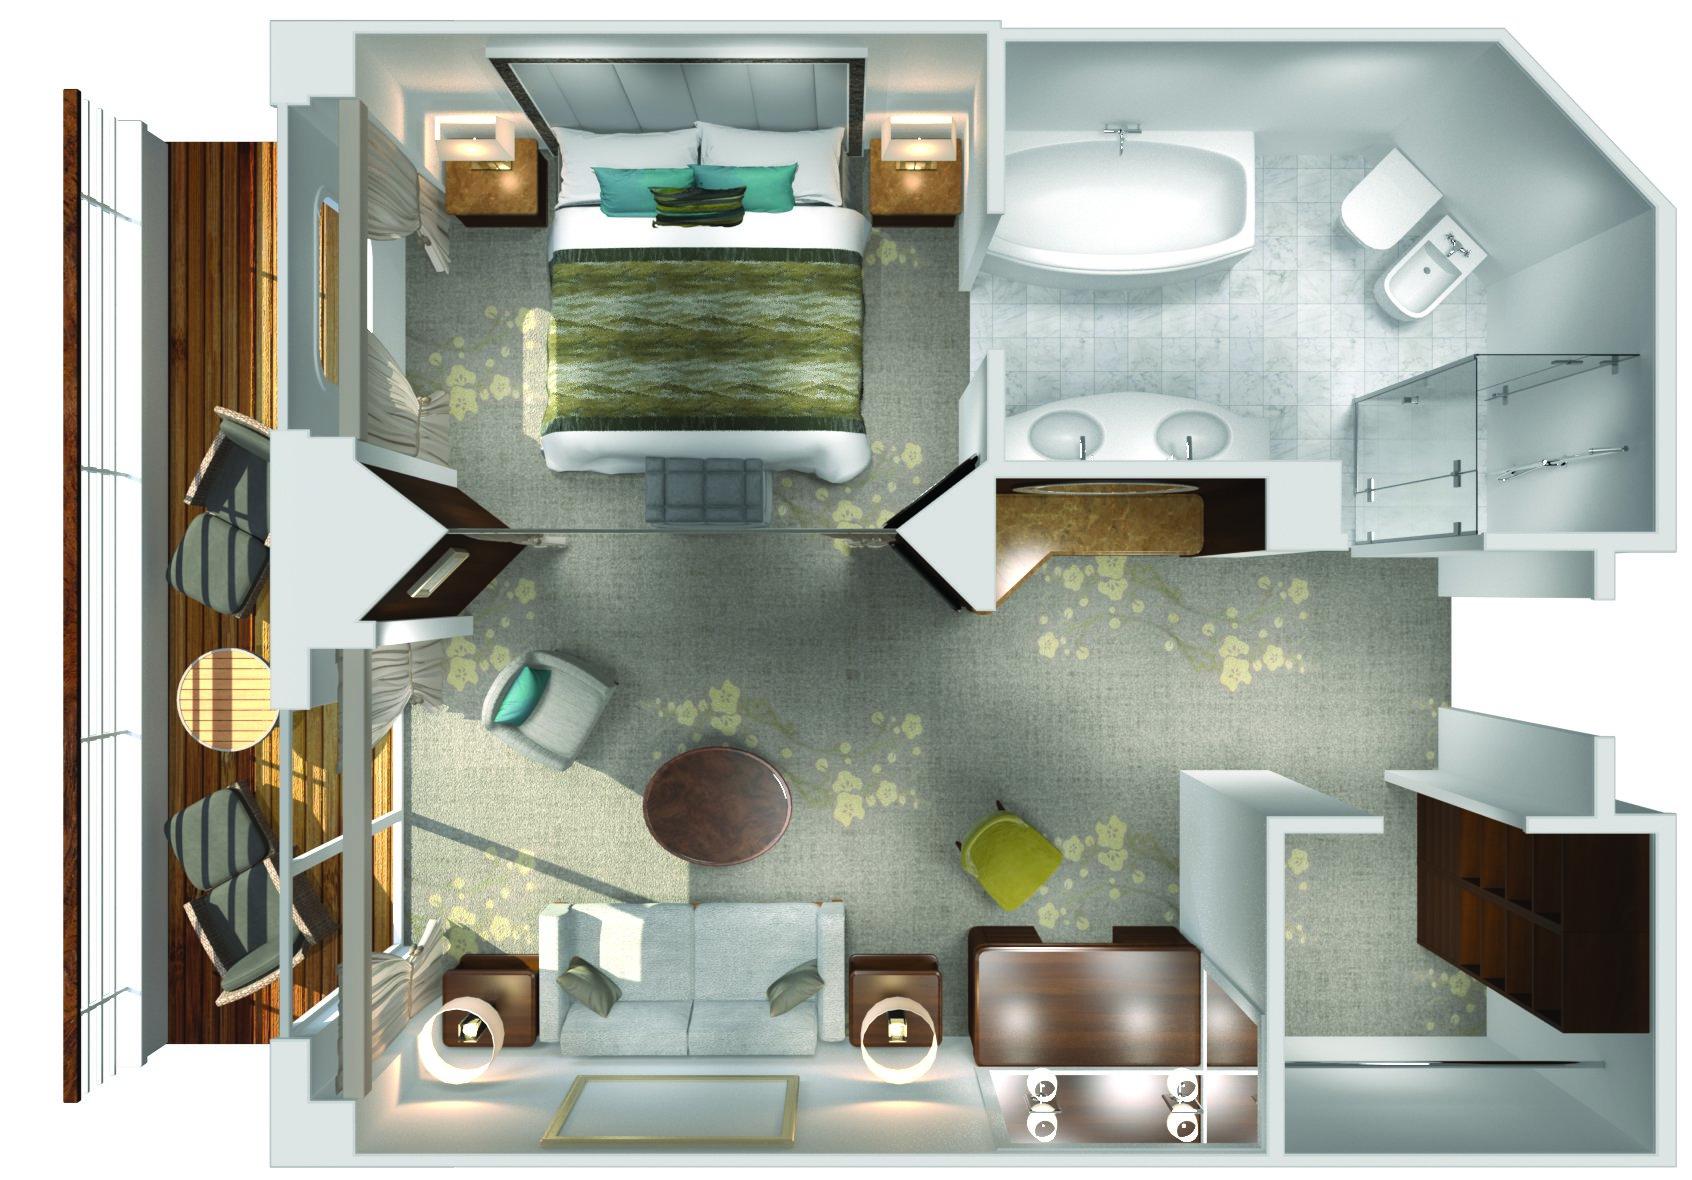 Penthouse Suite mit Veranda - Crystal Symphony - Penthouse Suite mit Veranda PS - Crystal Symphony - Bild 3 - Grundriss Thumb